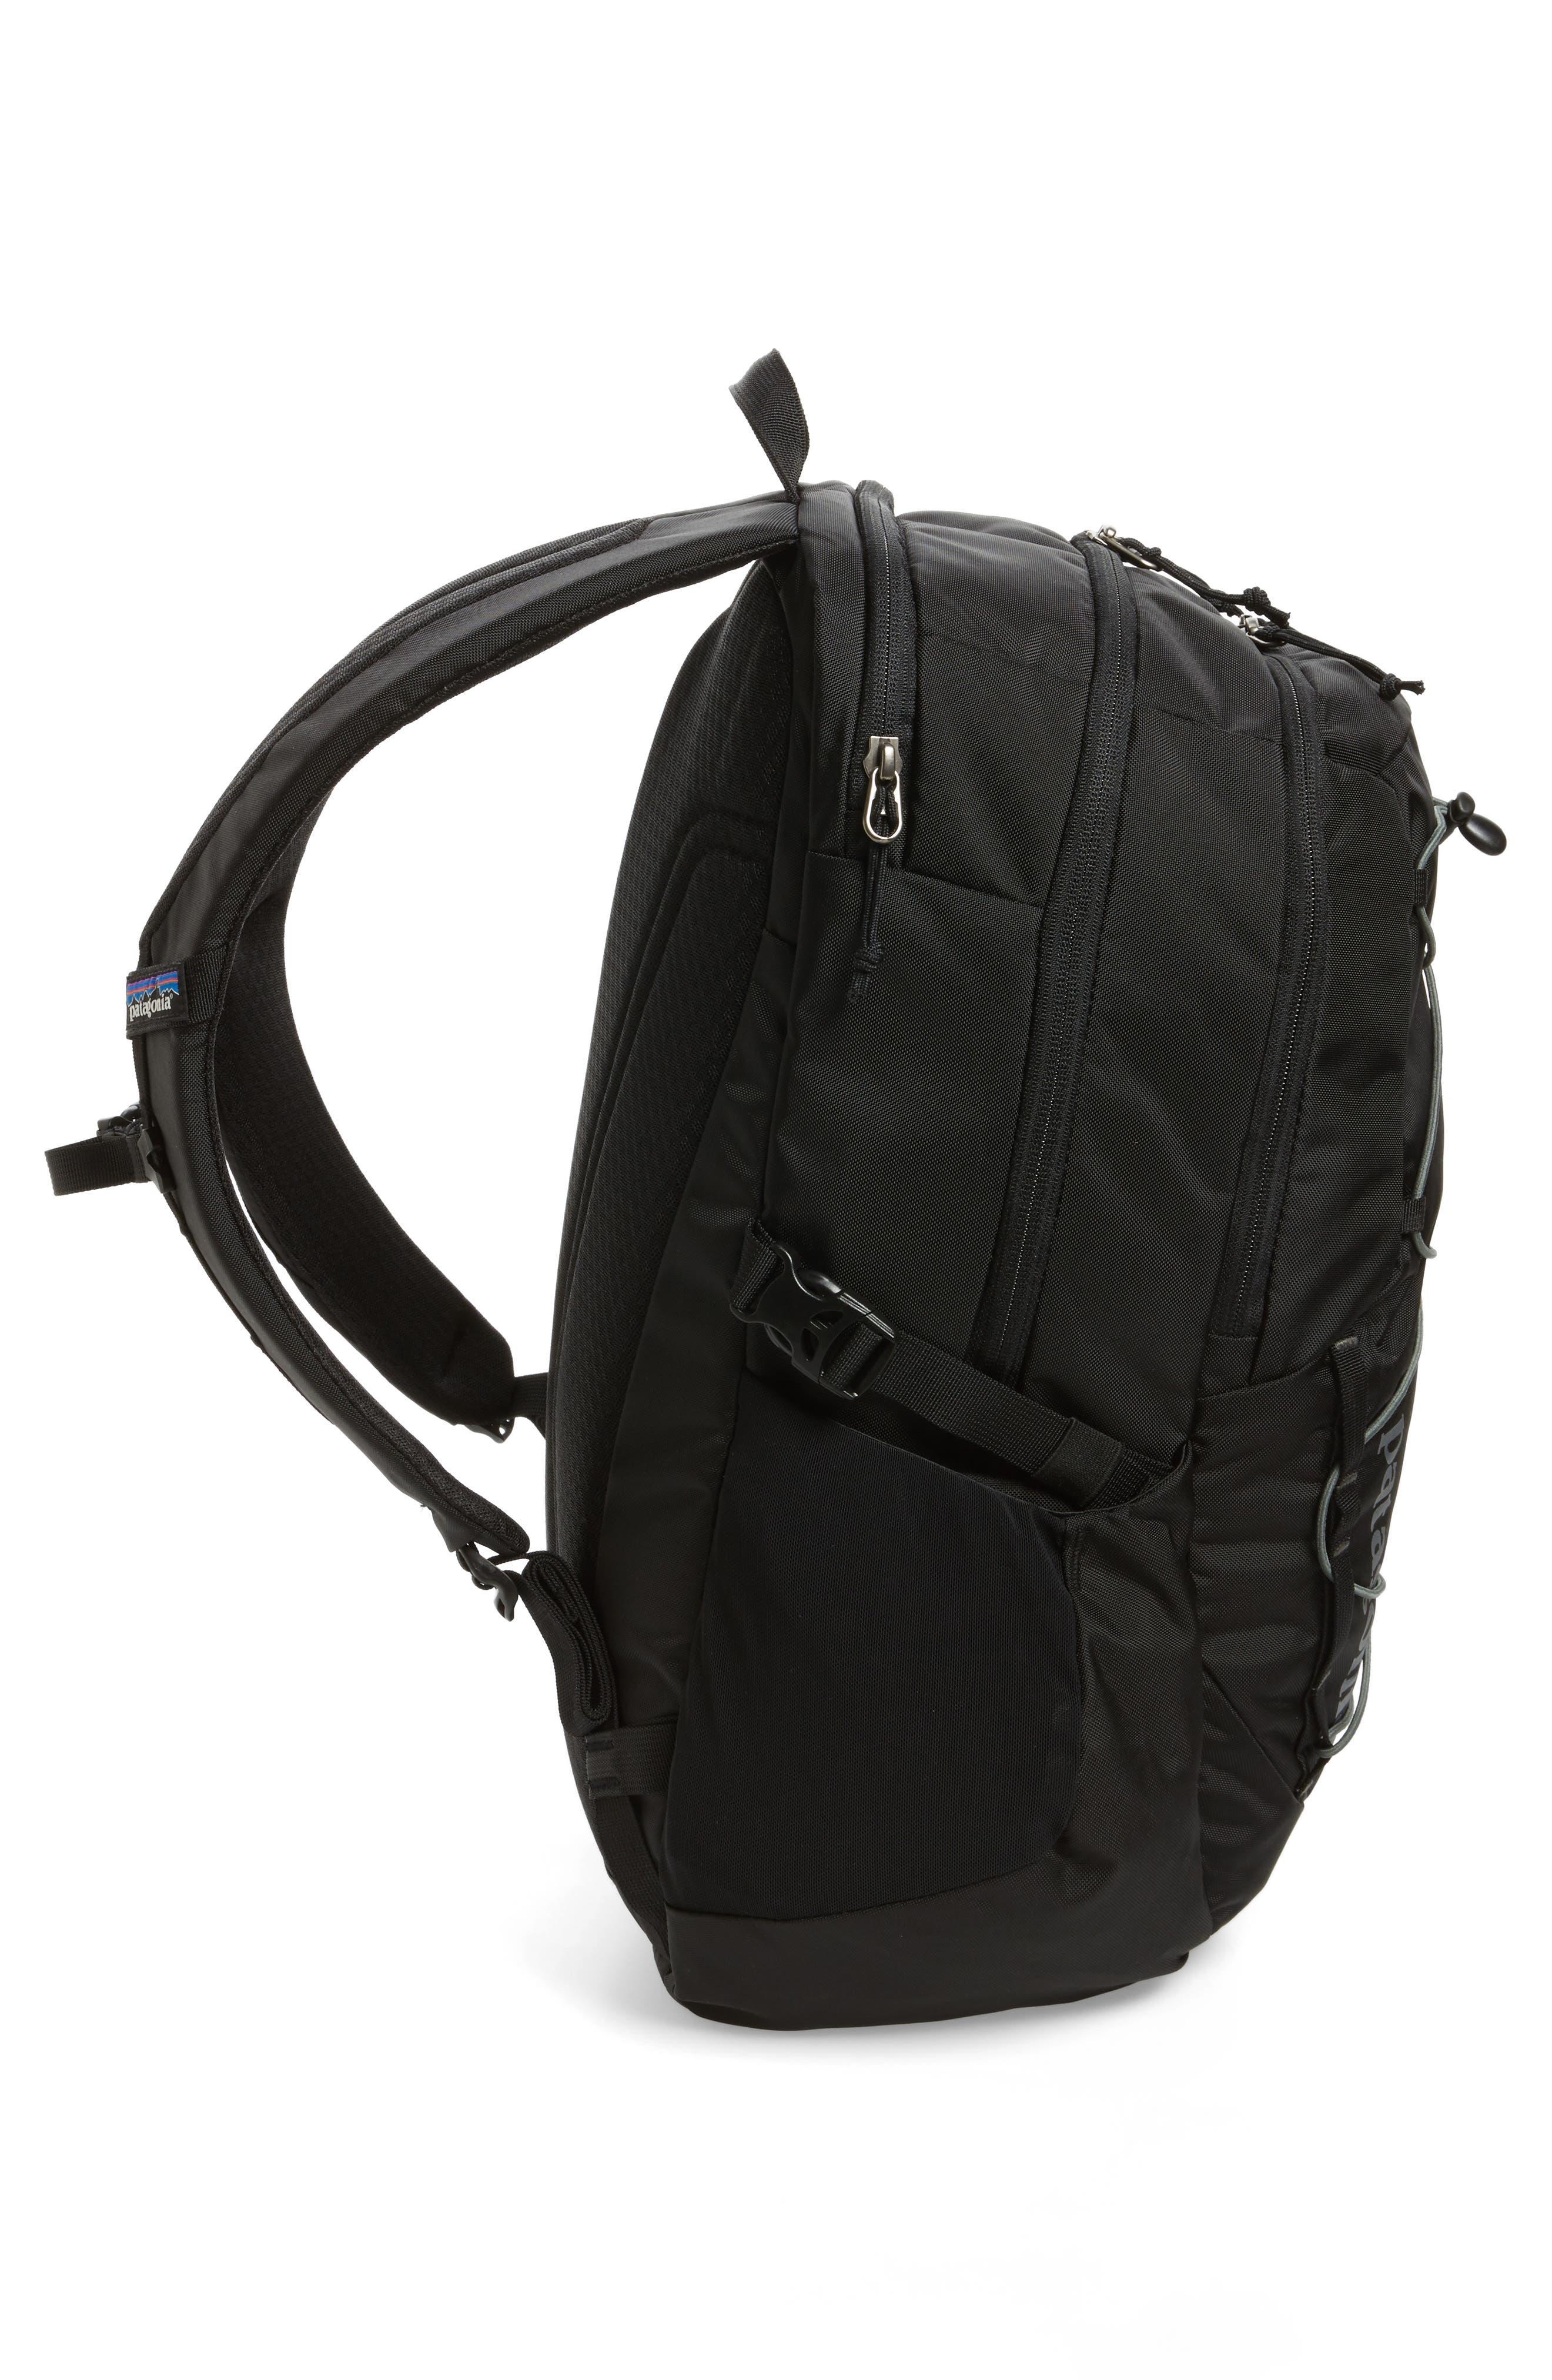 30L Chacabuco Backpack,                             Alternate thumbnail 5, color,                             BLACK